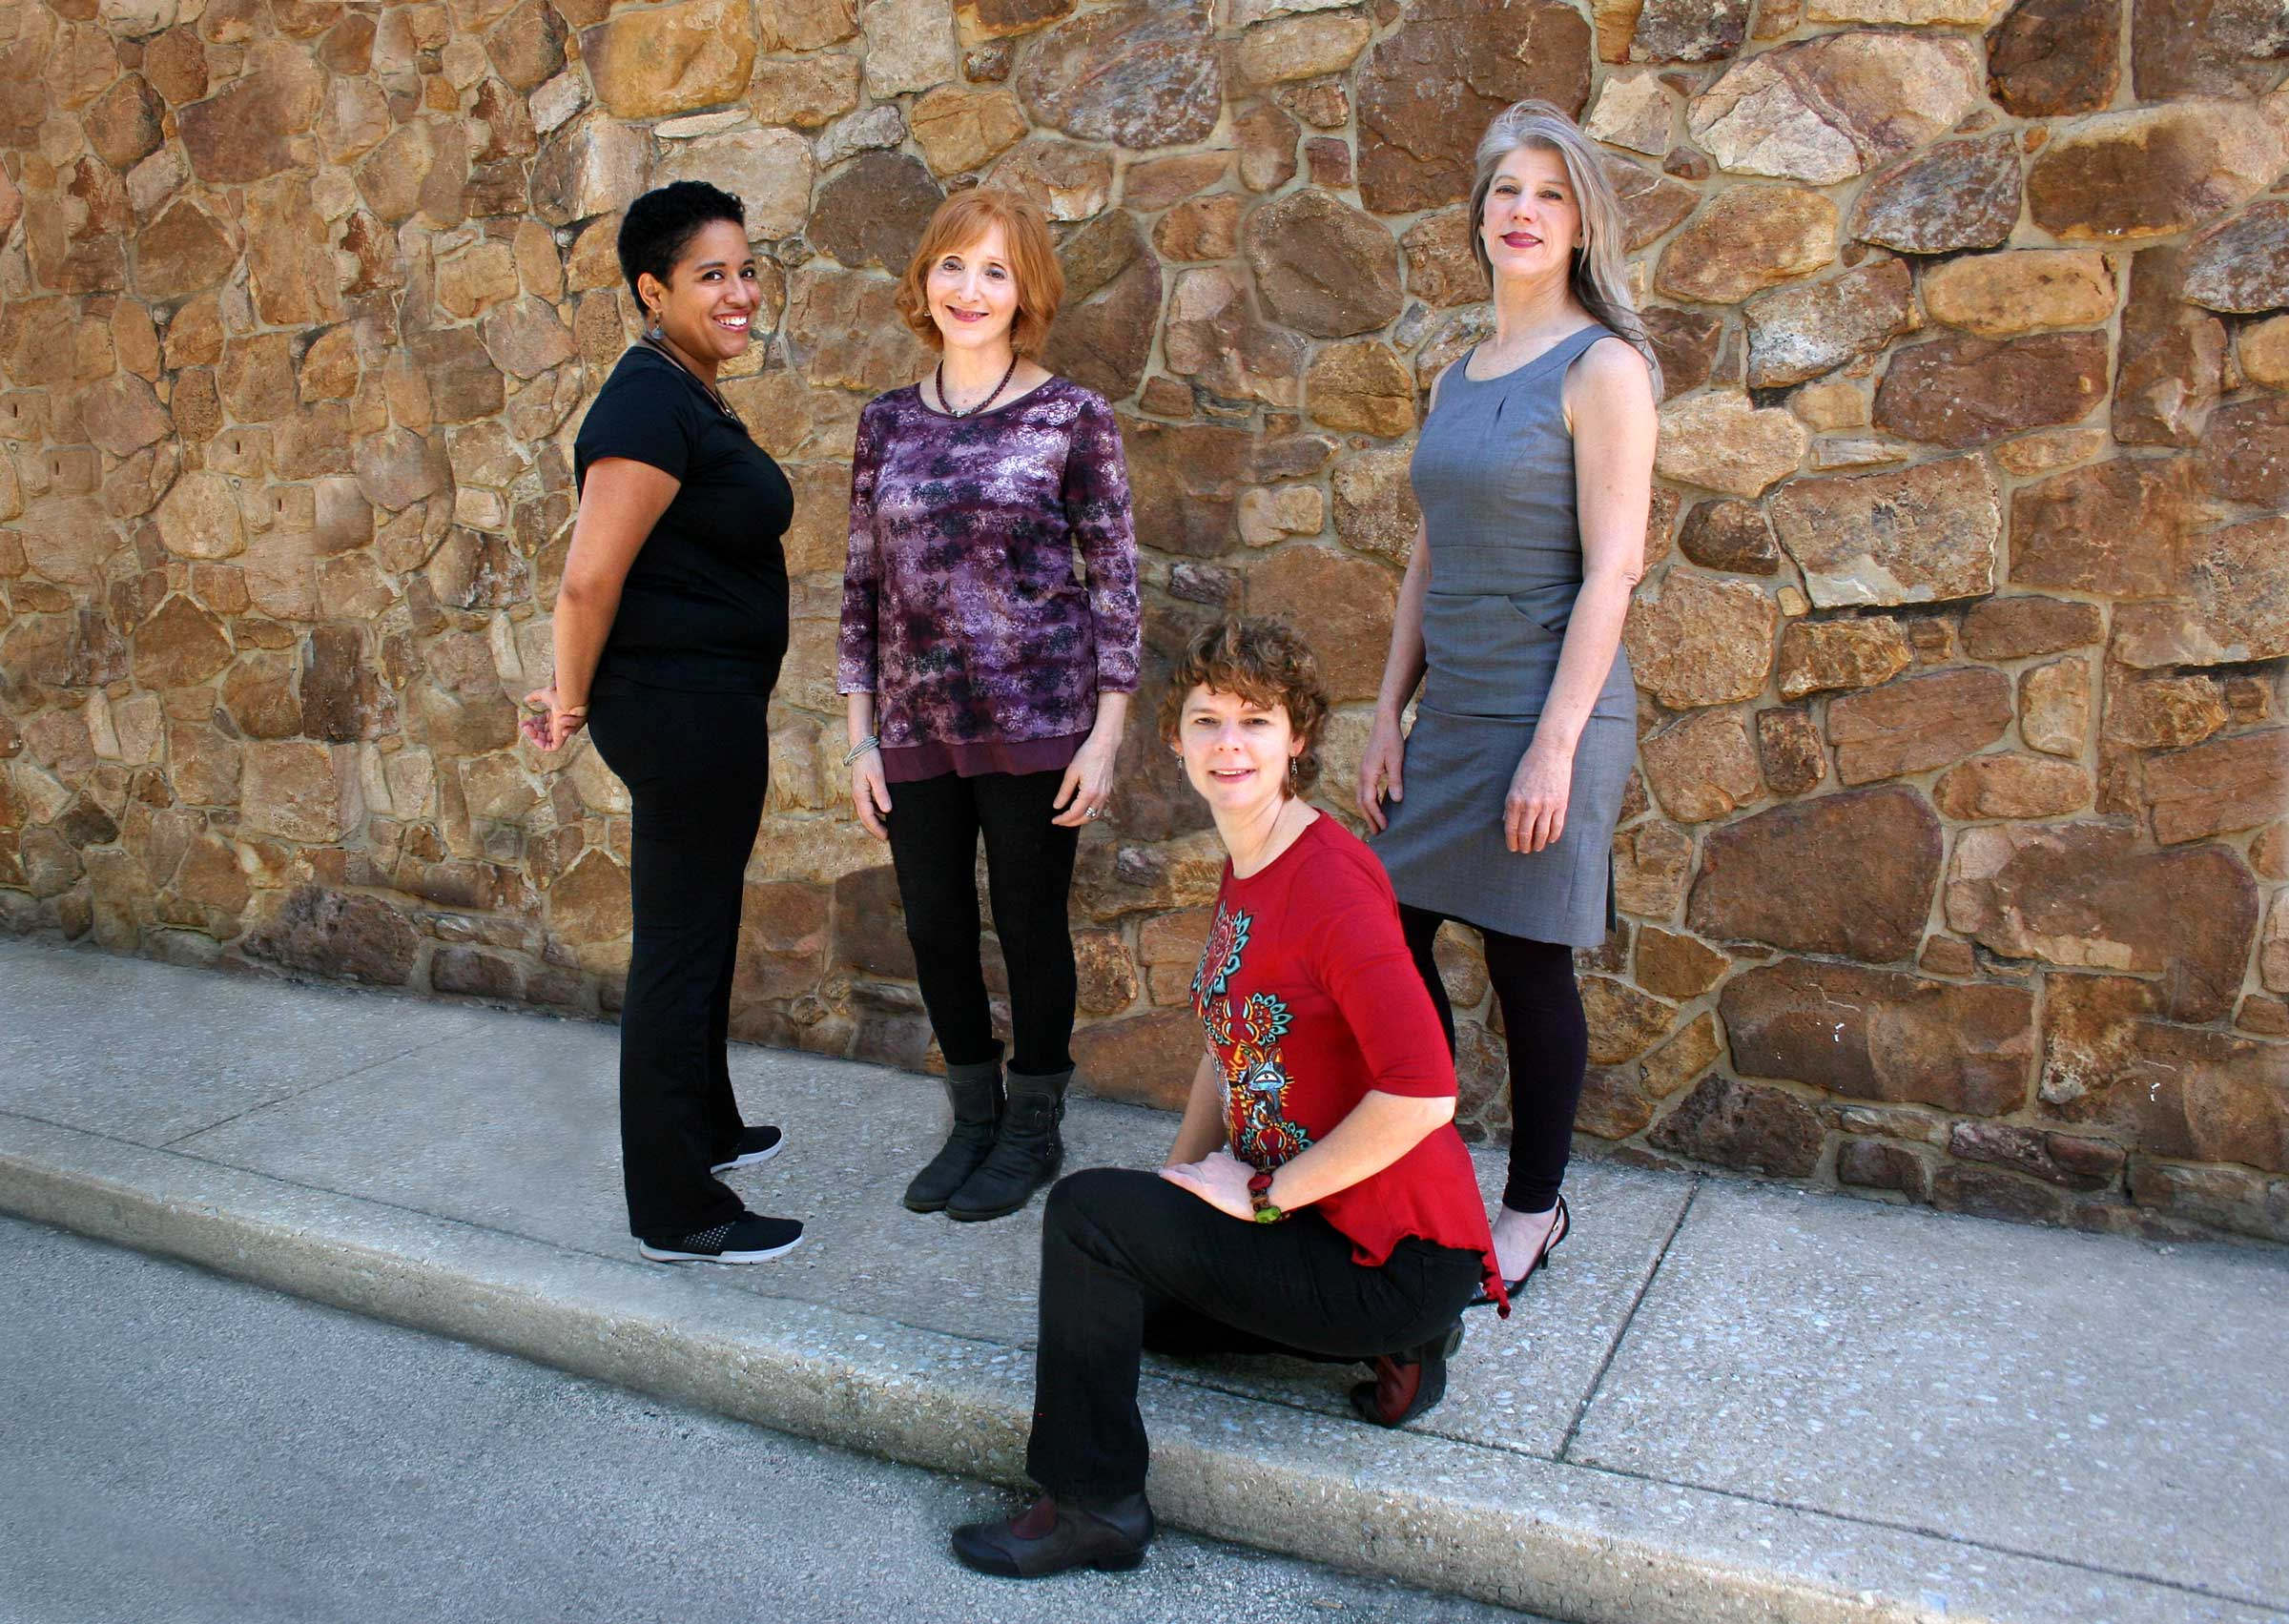 Bodycentric Healing Arts Staff